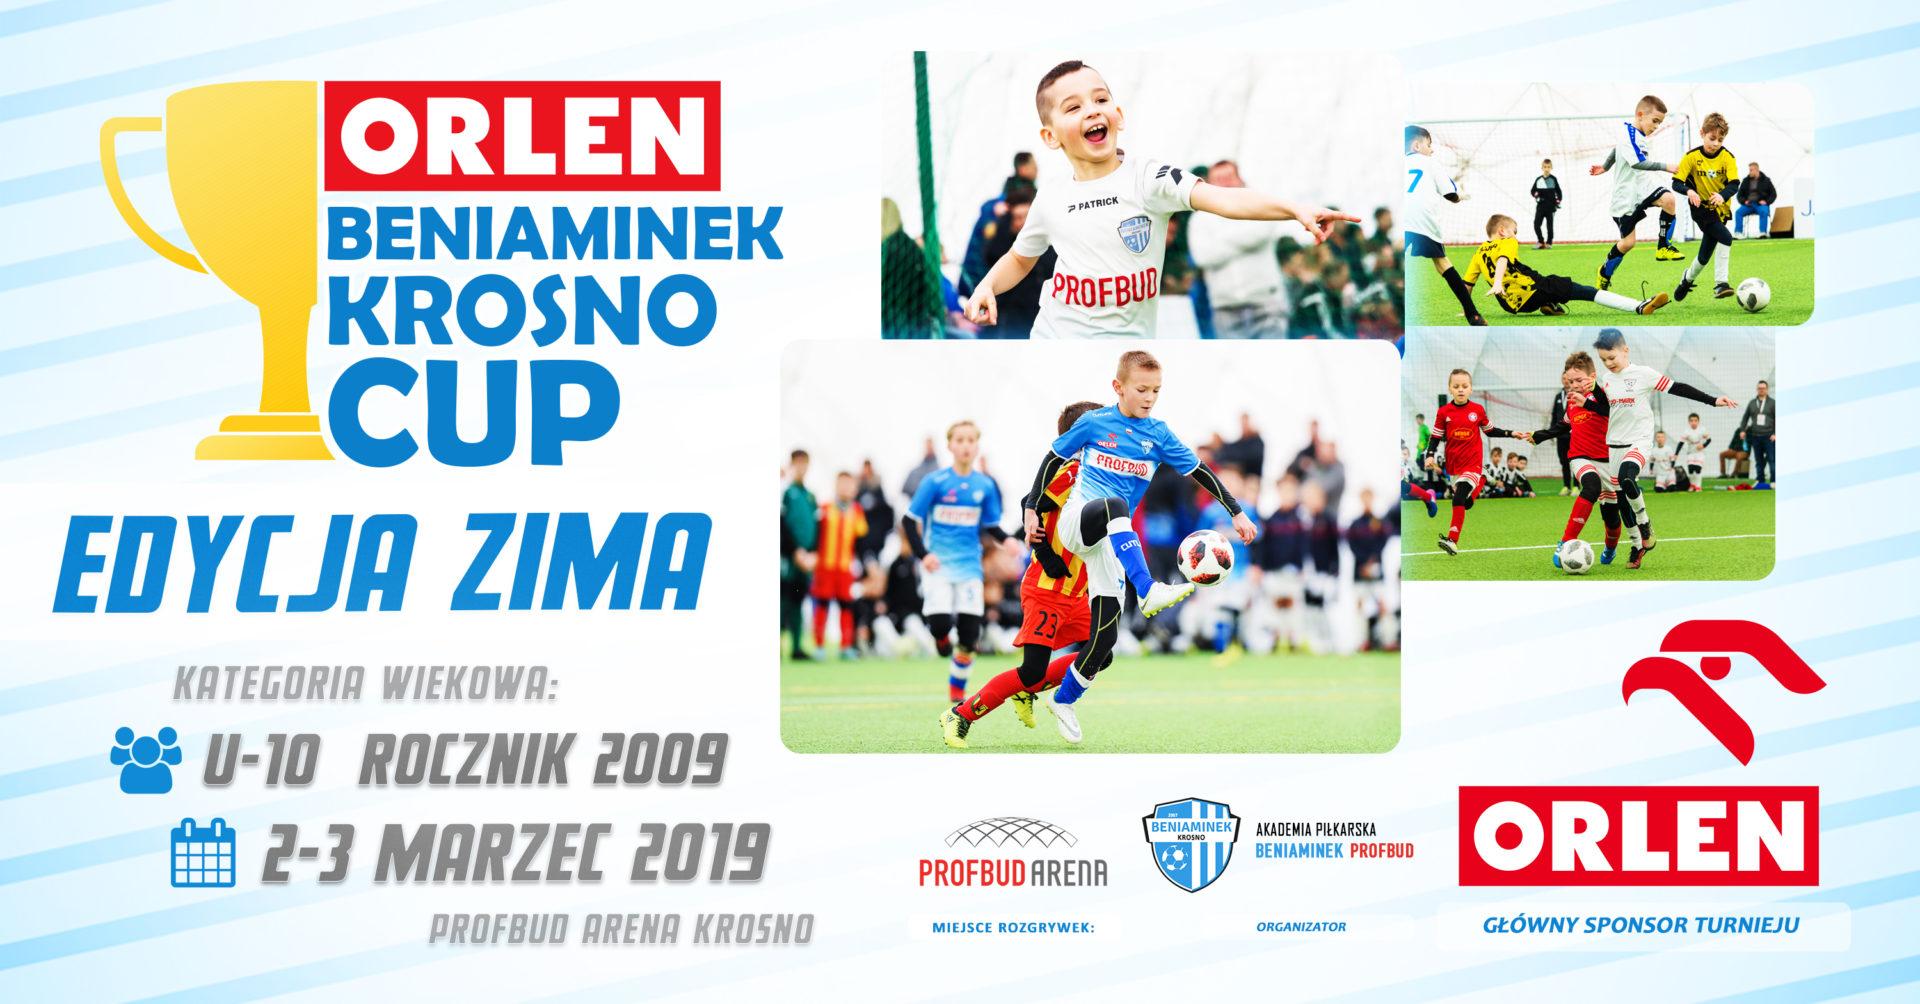 Orlen Beniaminek Krosno Cup rocznik 2009